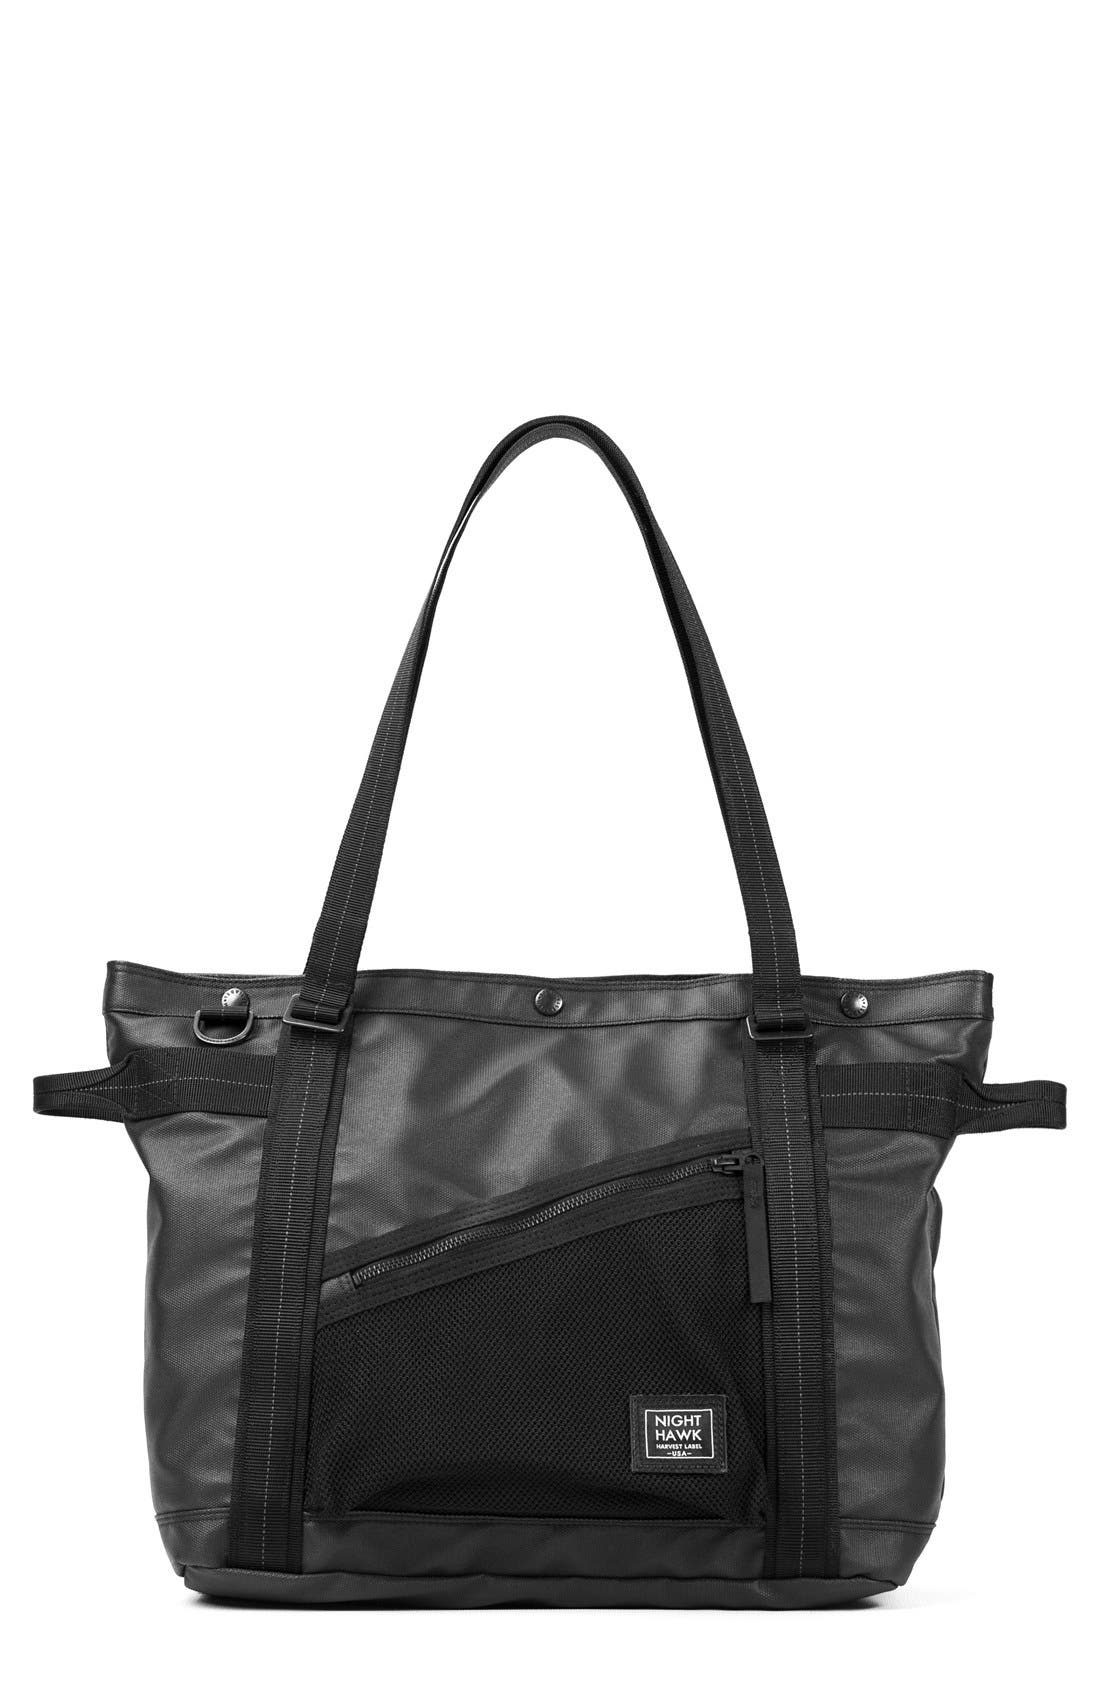 Harvest Label 'NightHawk' Tote Bag